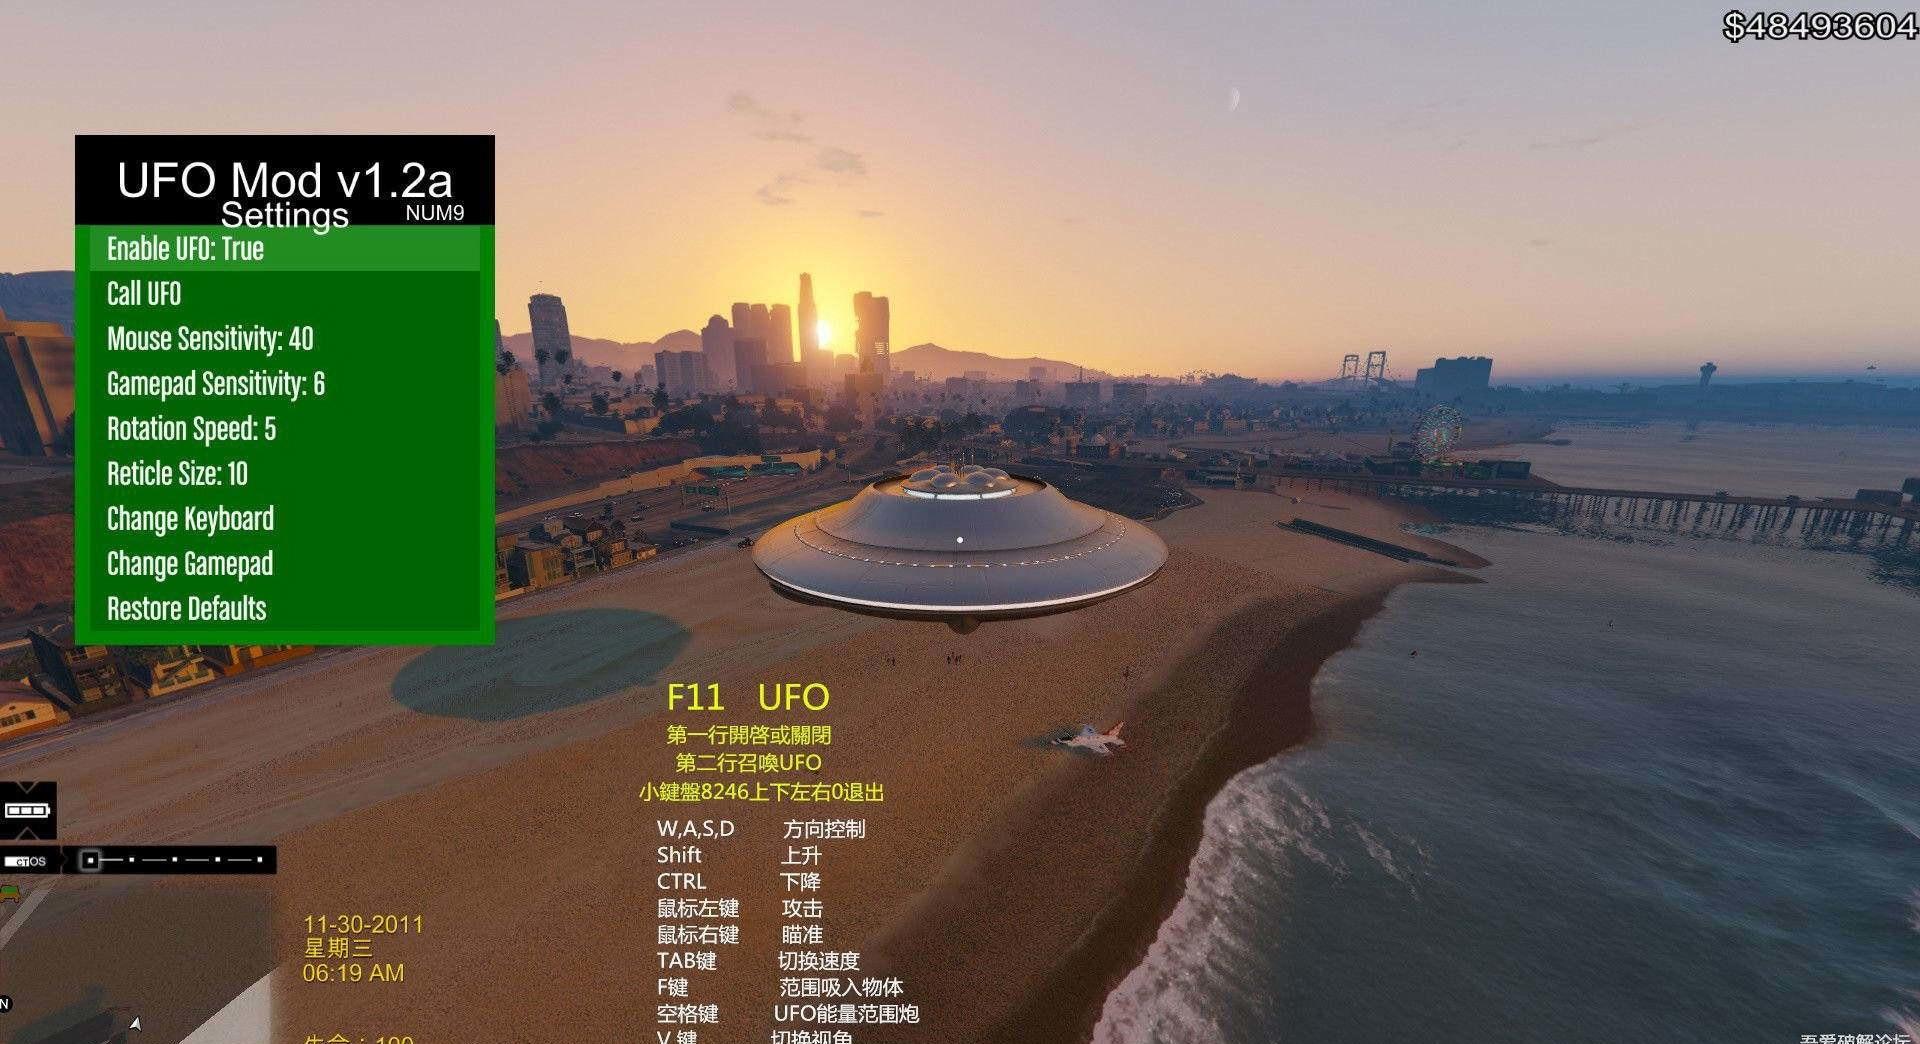 【3D/GTA整合】绅士GTA5 新春贺岁版1.41VIP MOD整合汉化版(内含安装教程视频)91G